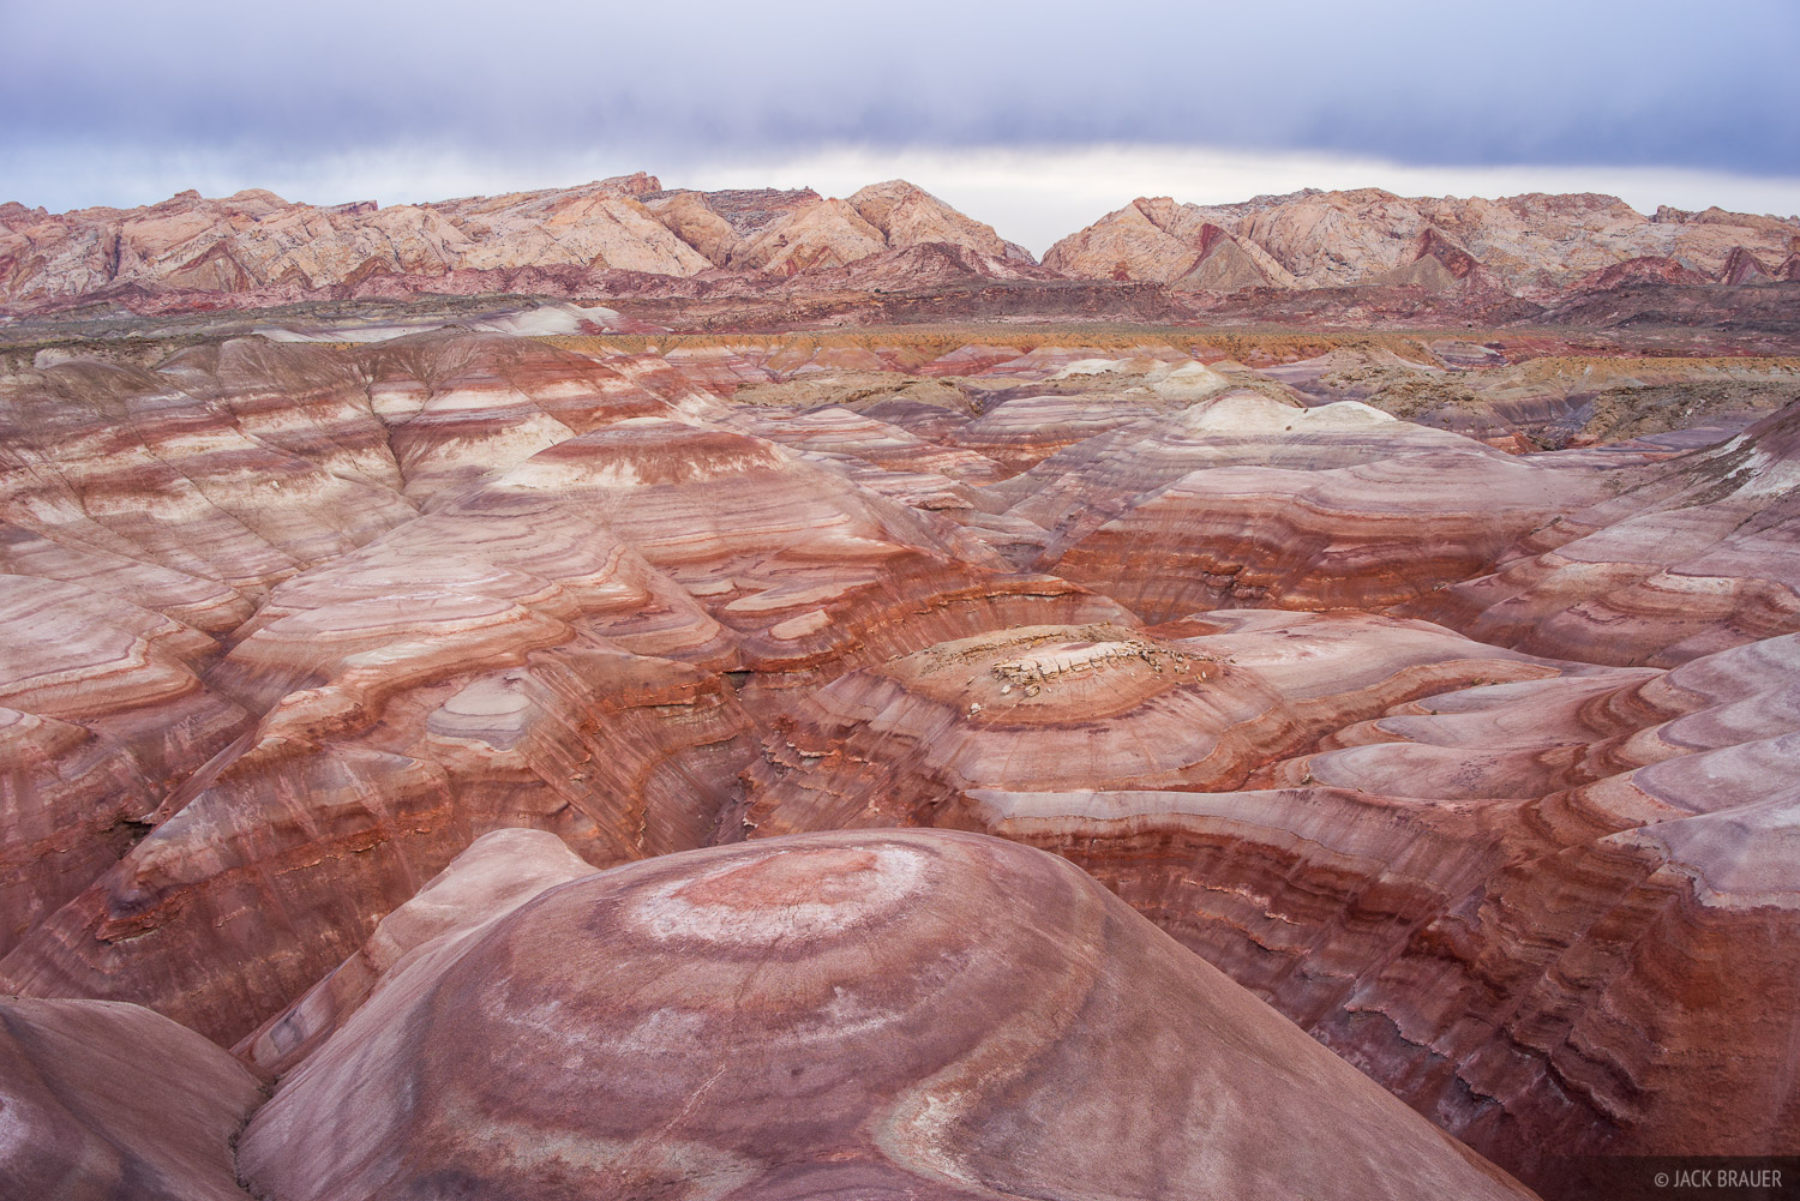 A labyrinth of colorful bentonite hills.